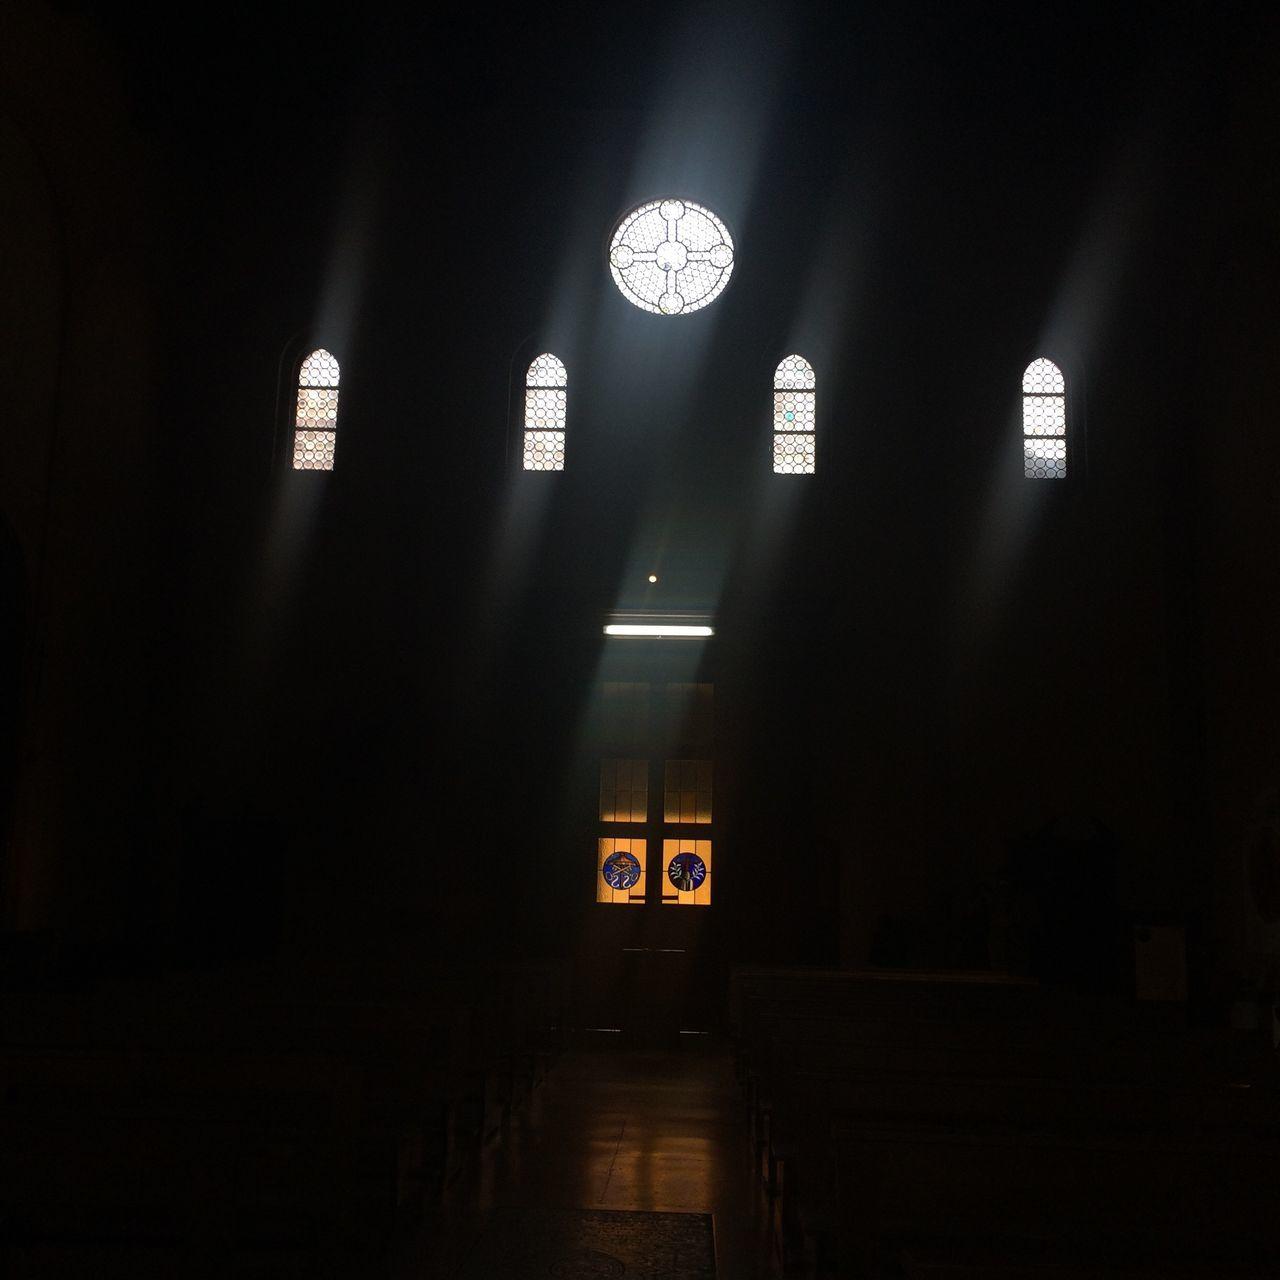 indoors, illuminated, dark, built structure, architecture, no people, night